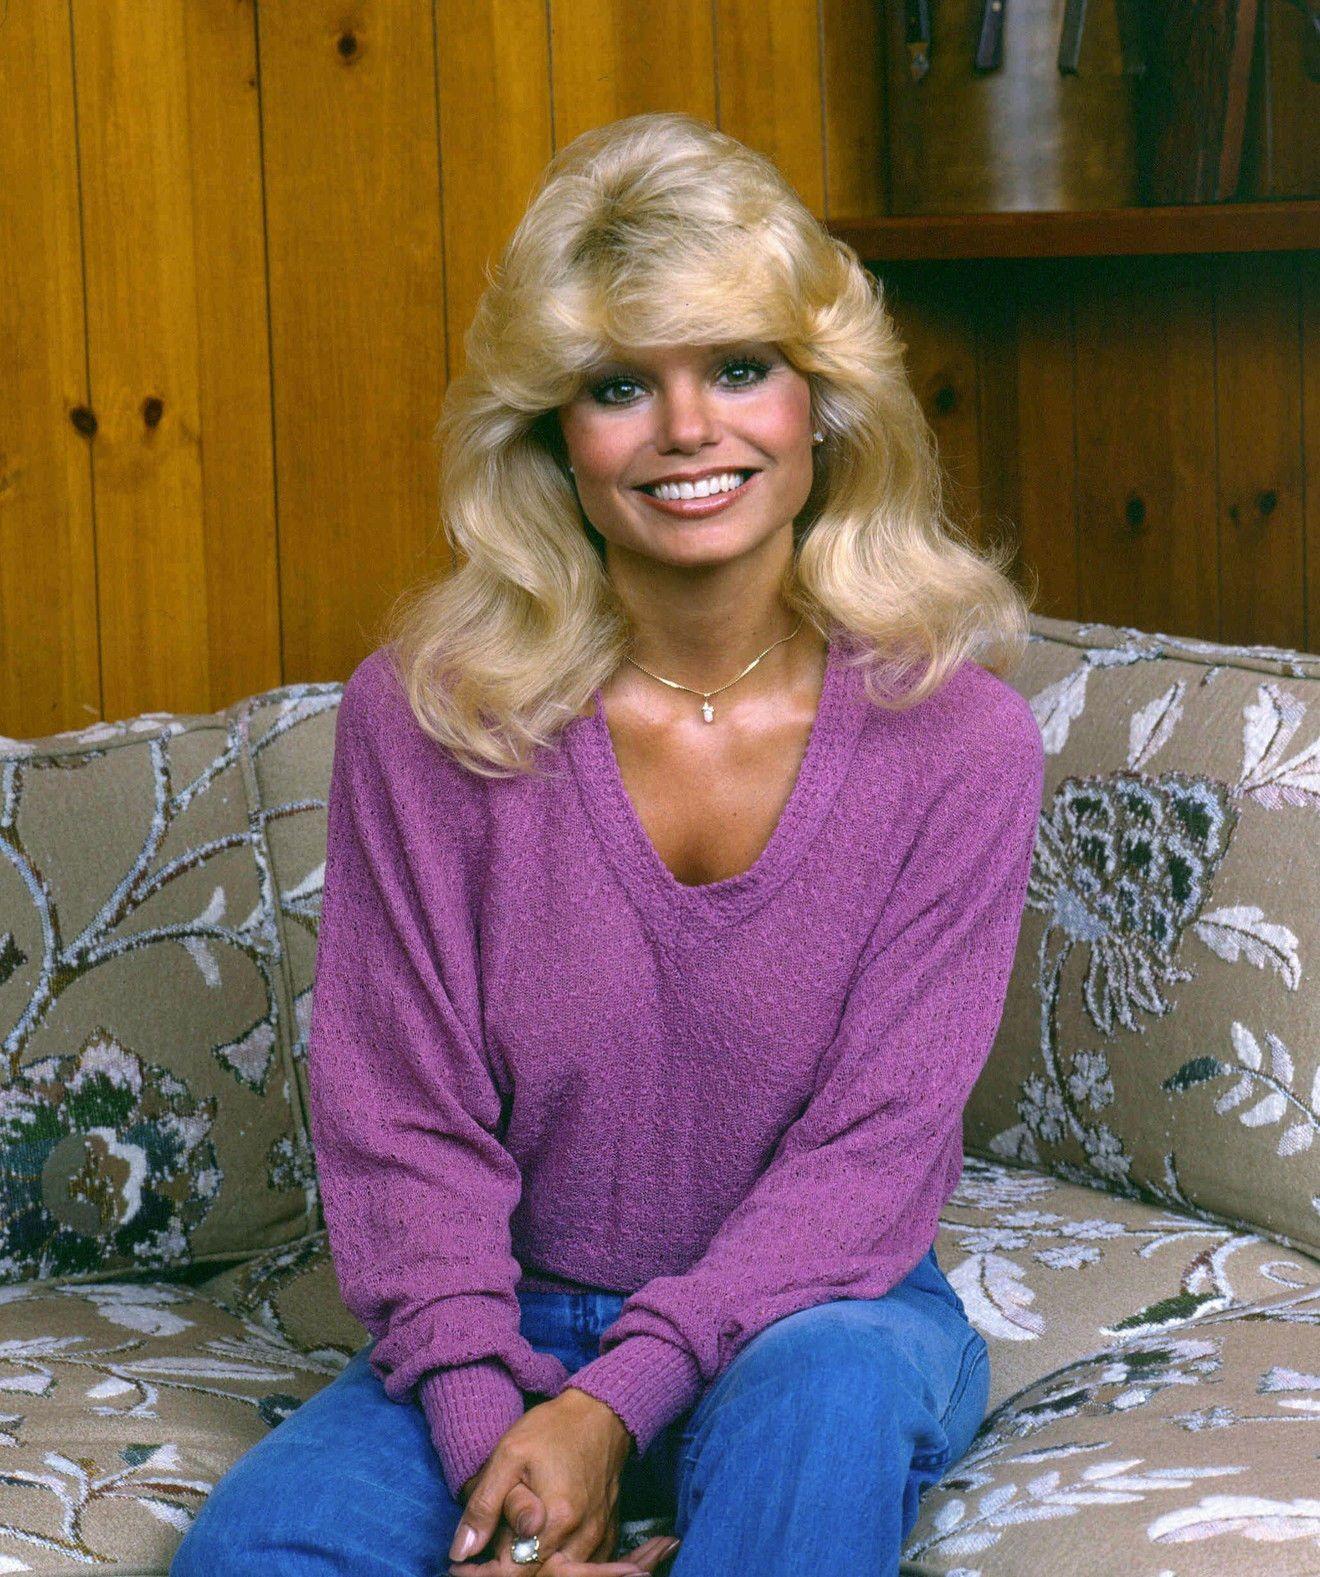 Loni Anderson born August 5, 1946 (age 72)